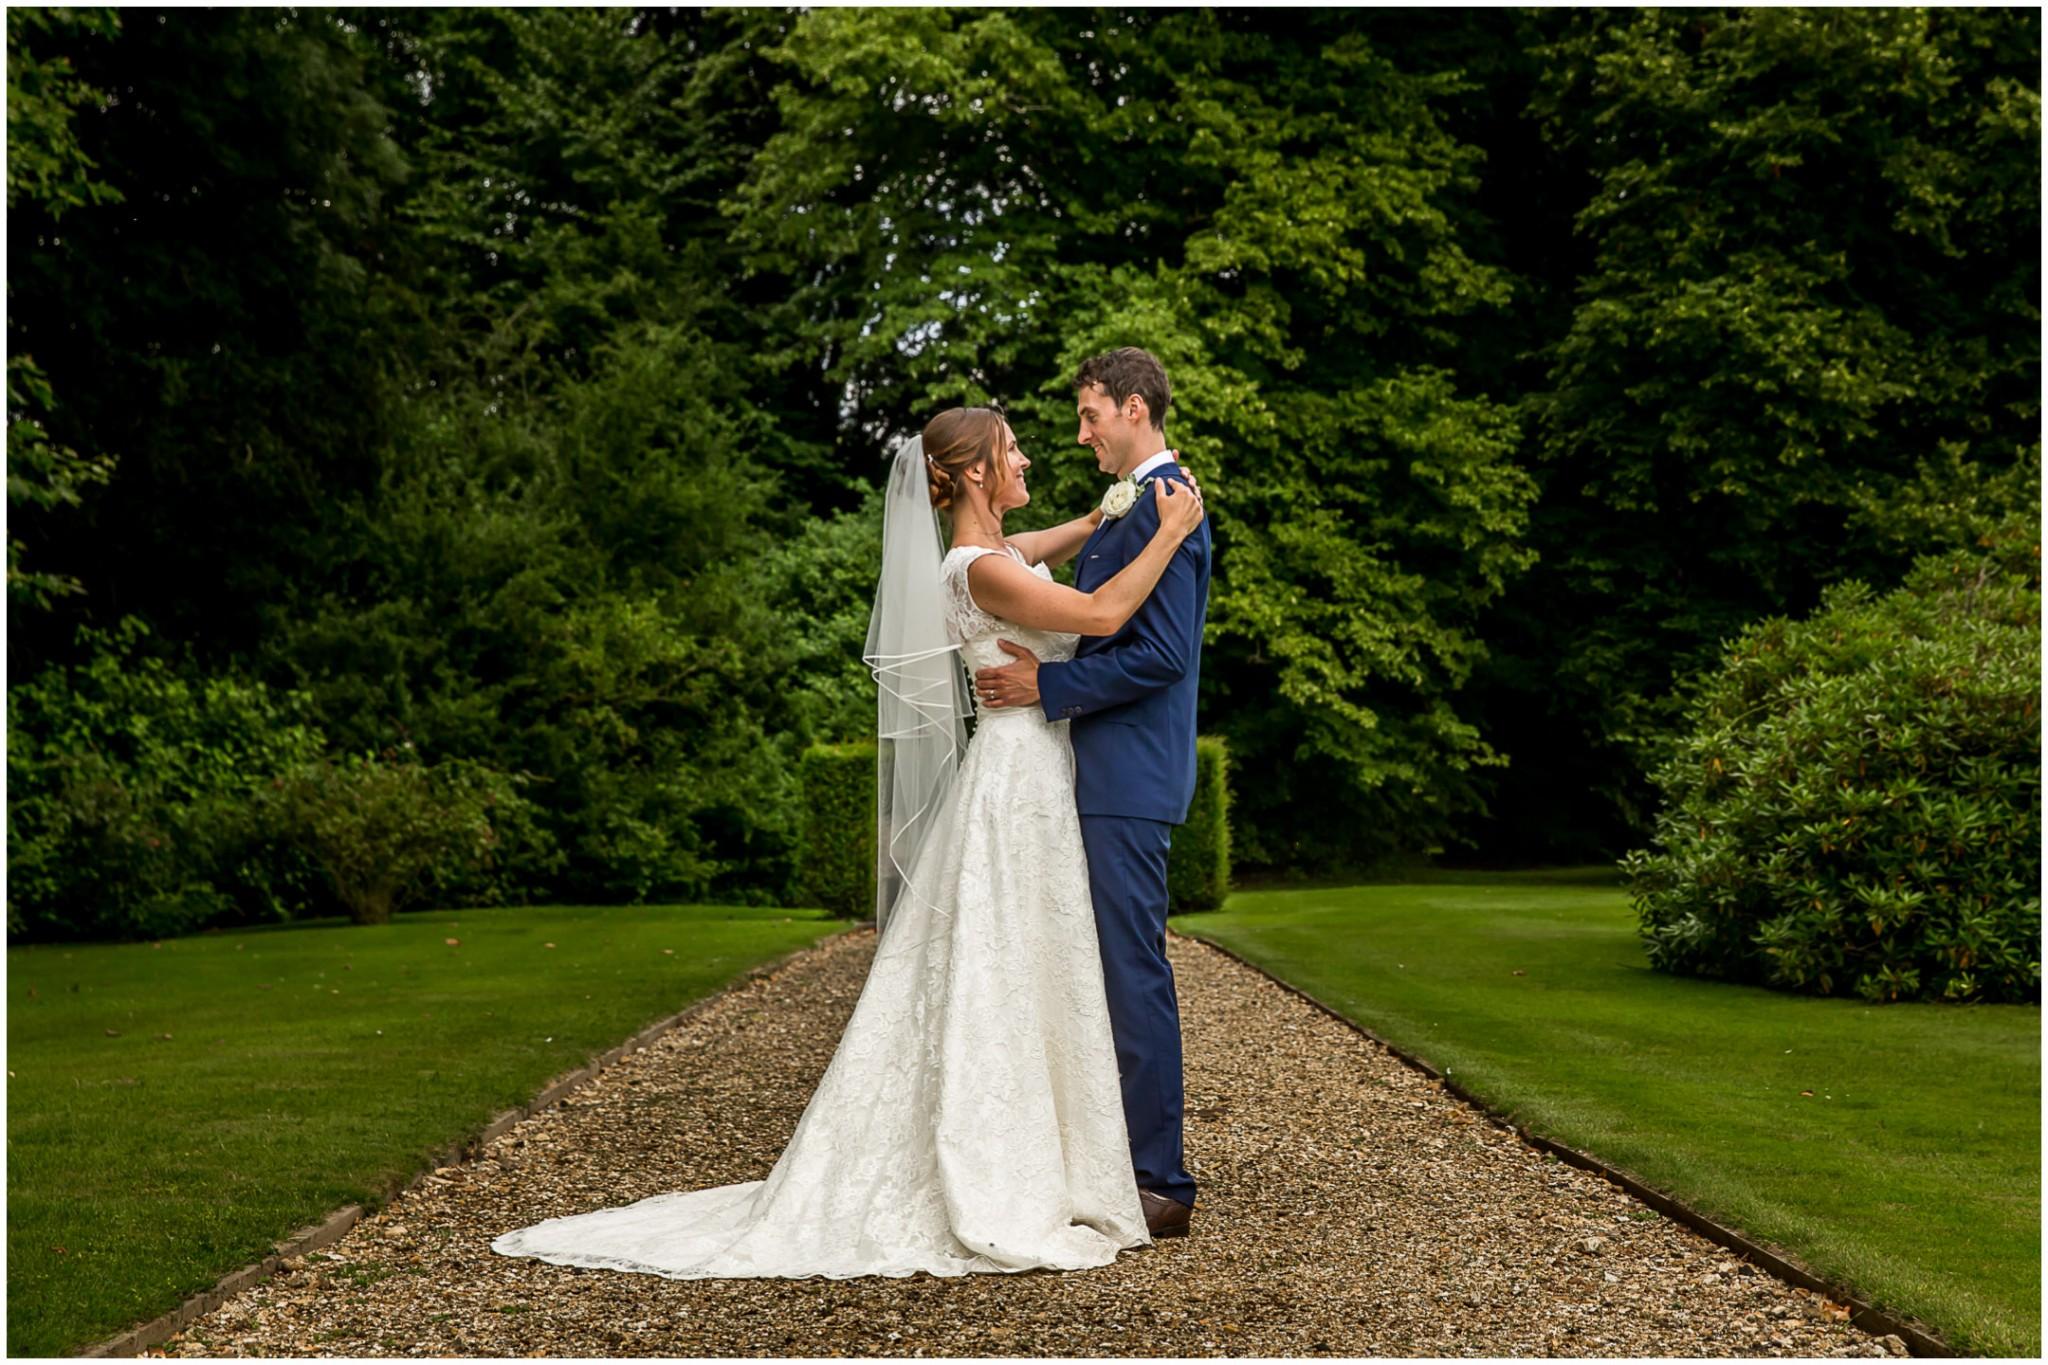 Avington Park Wedding Bride & Groom Portrait 001